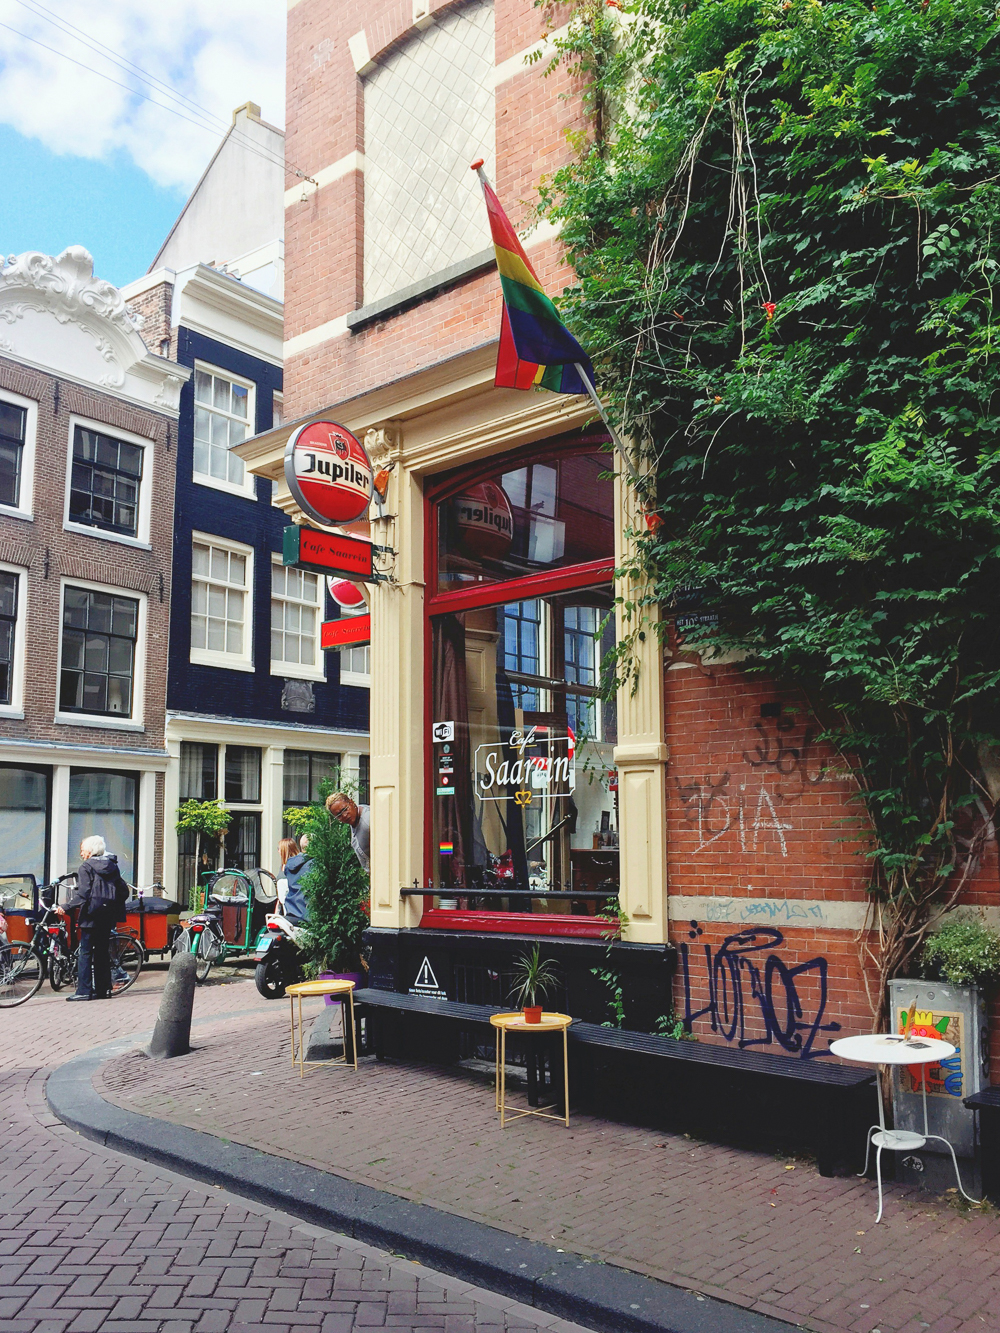 Café Saarein, Amsterdam, Netherlands